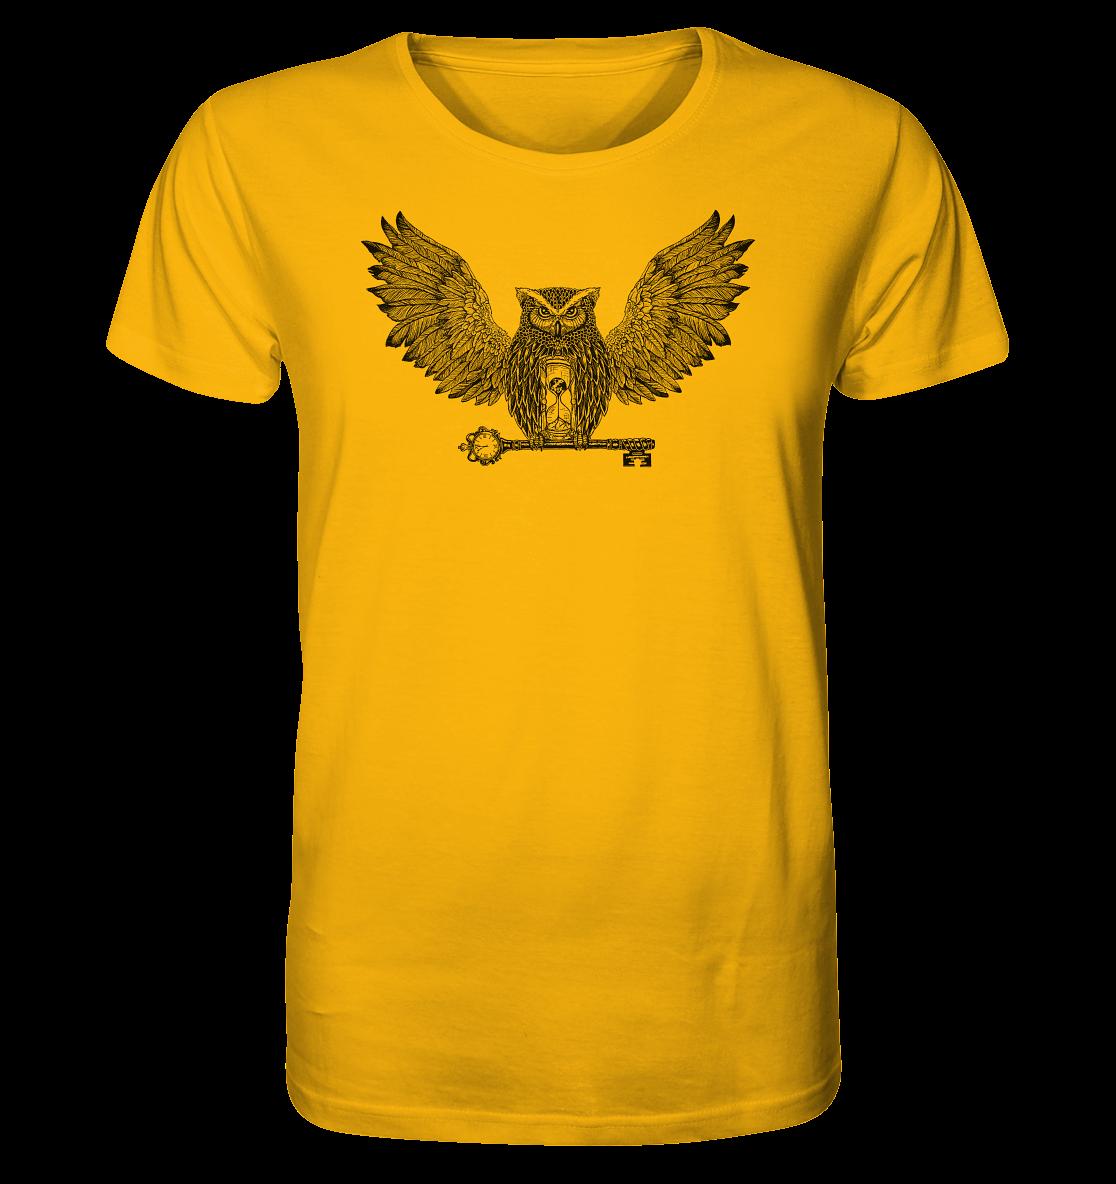 front-organic-shirt-fab40d-1116x-5.png